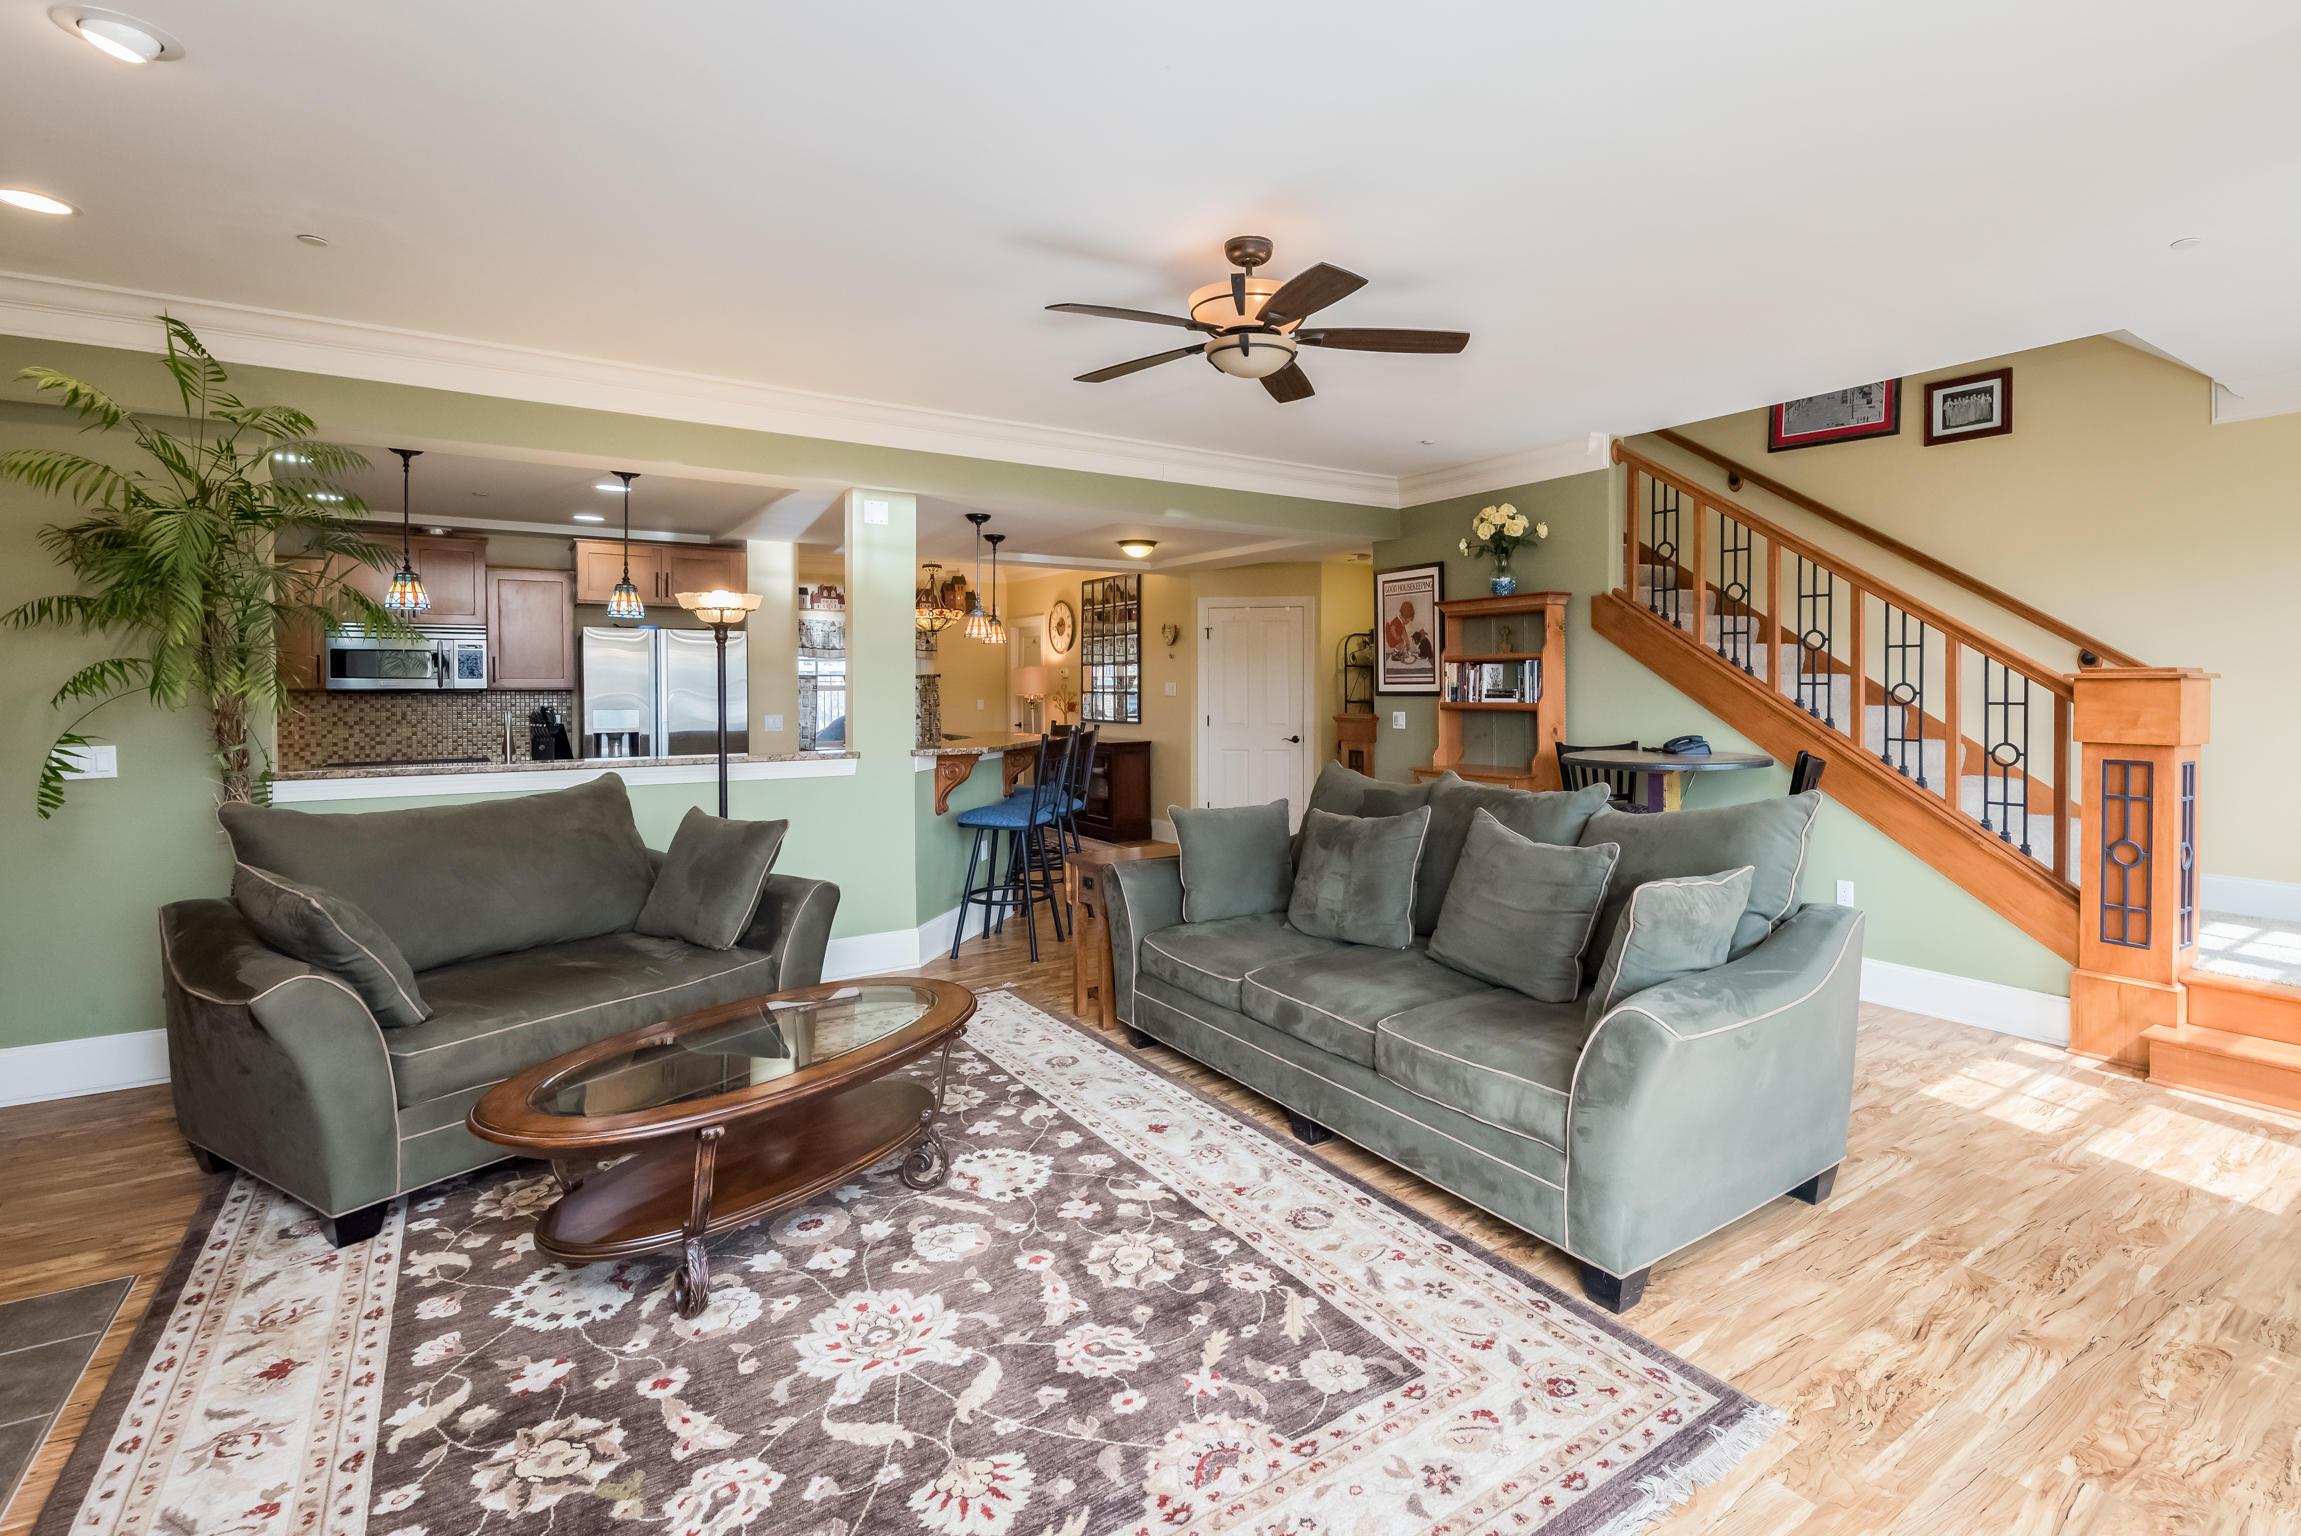 822 Hamilton St, Milwaukee, Wisconsin 53202, 3 Bedrooms Bedrooms, ,2 BathroomsBathrooms,Condominiums,For Sale,Hamilton St,1,1628323